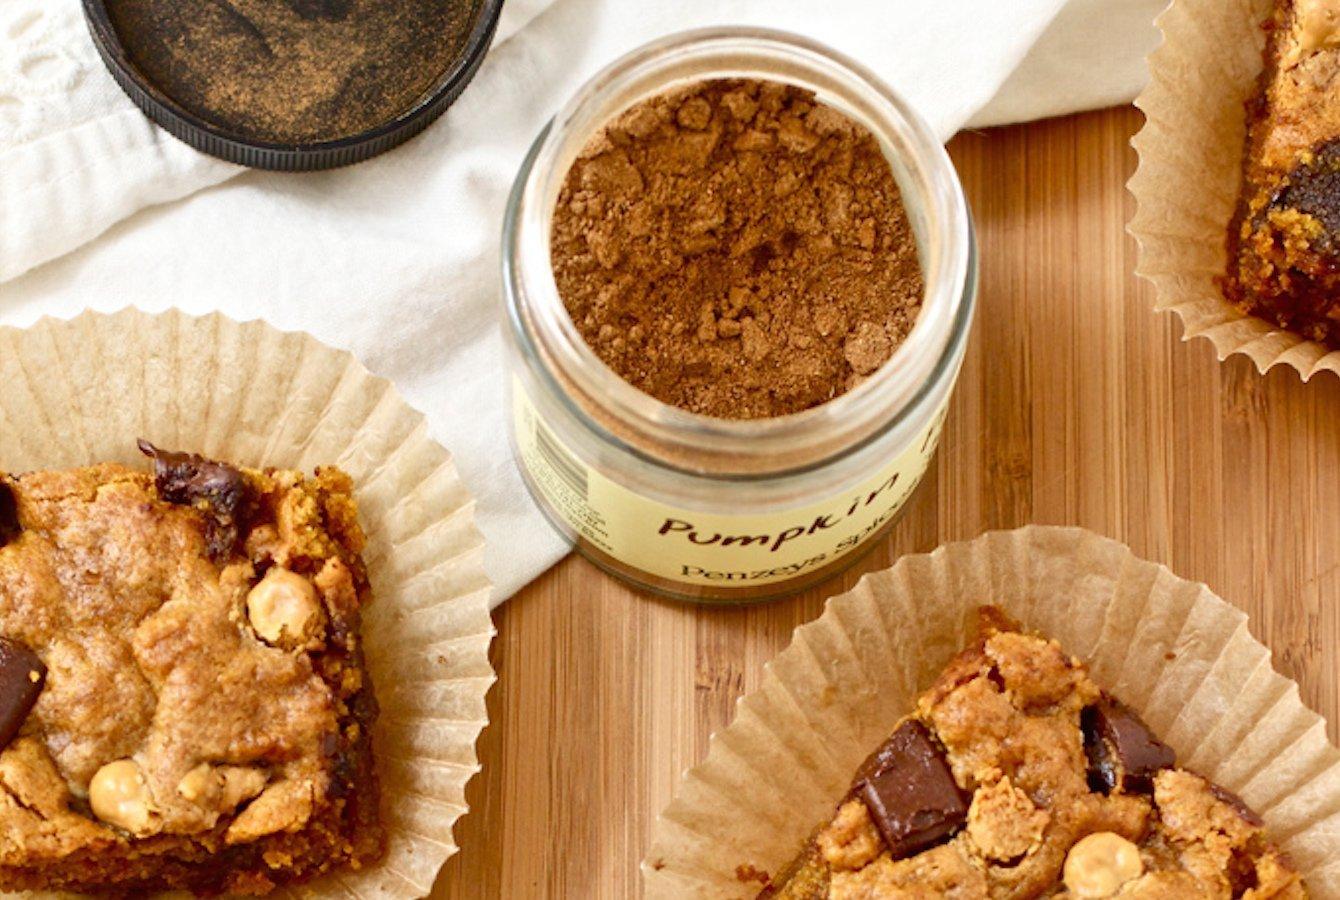 DIY: Homemade Pumpkin Pie Spice